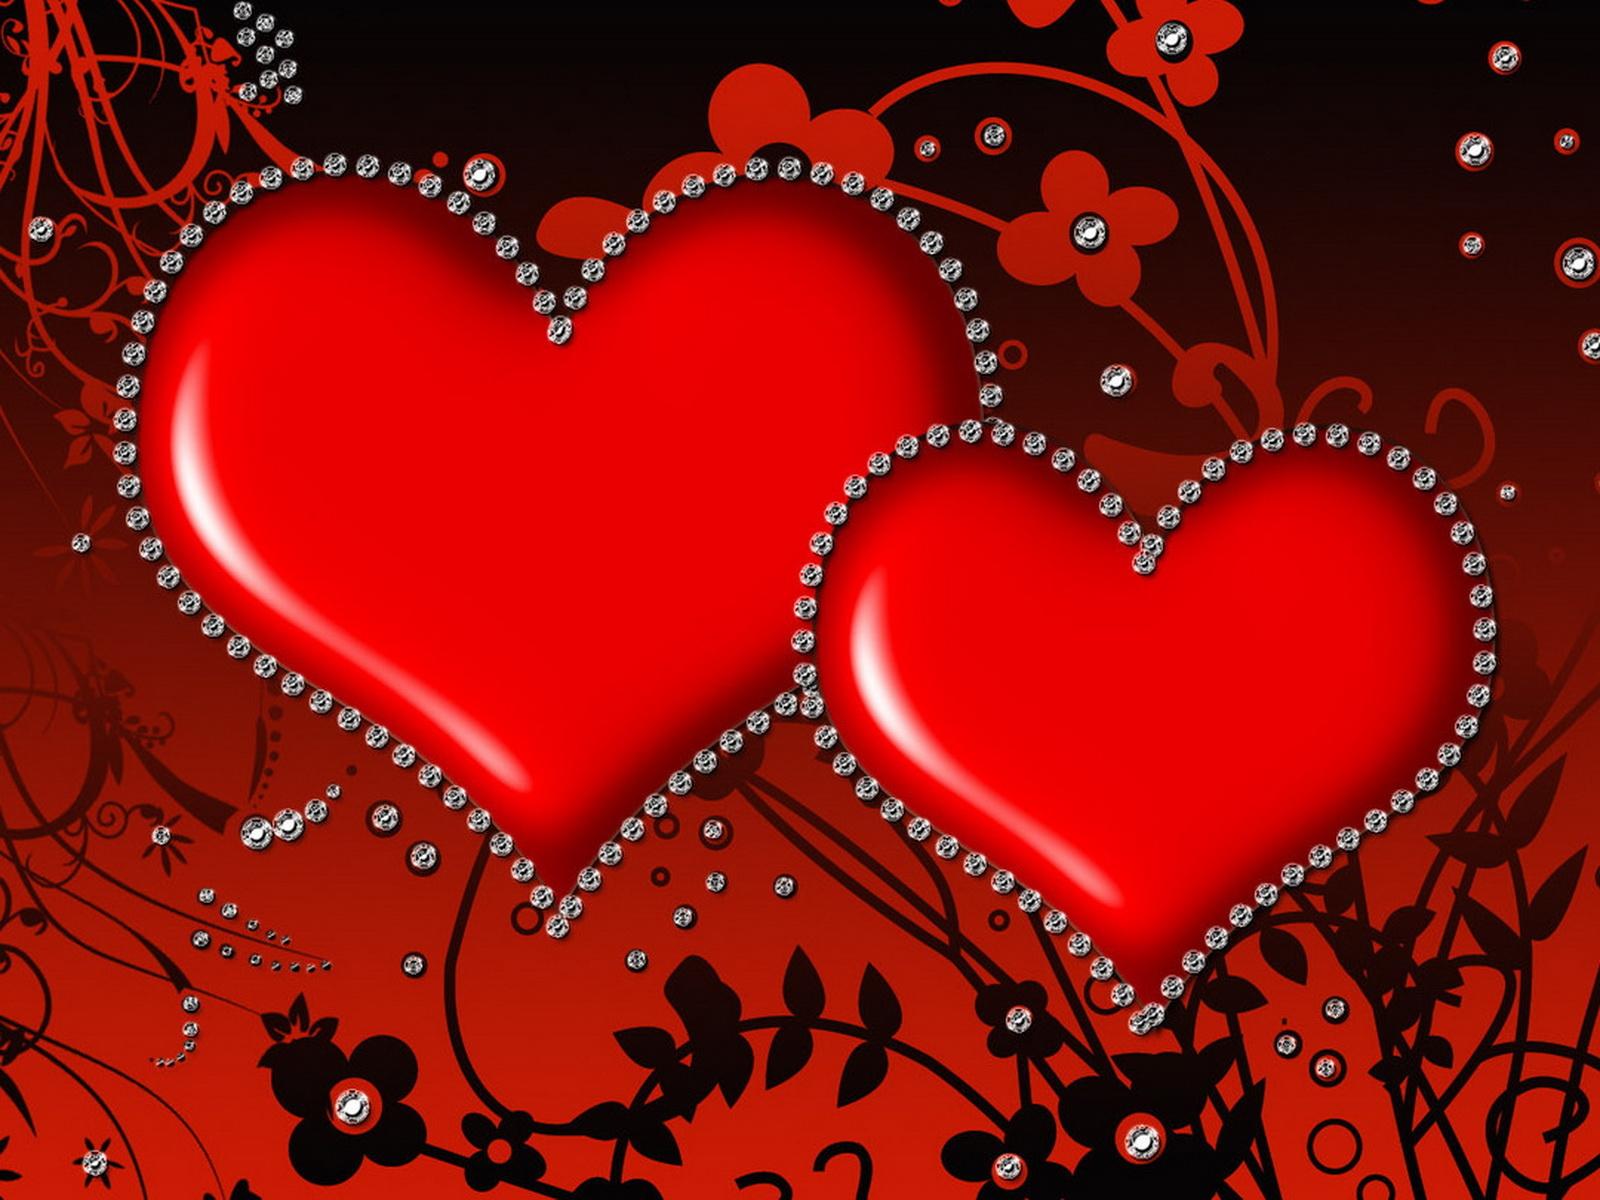 Картинка открытка с сердечком 781